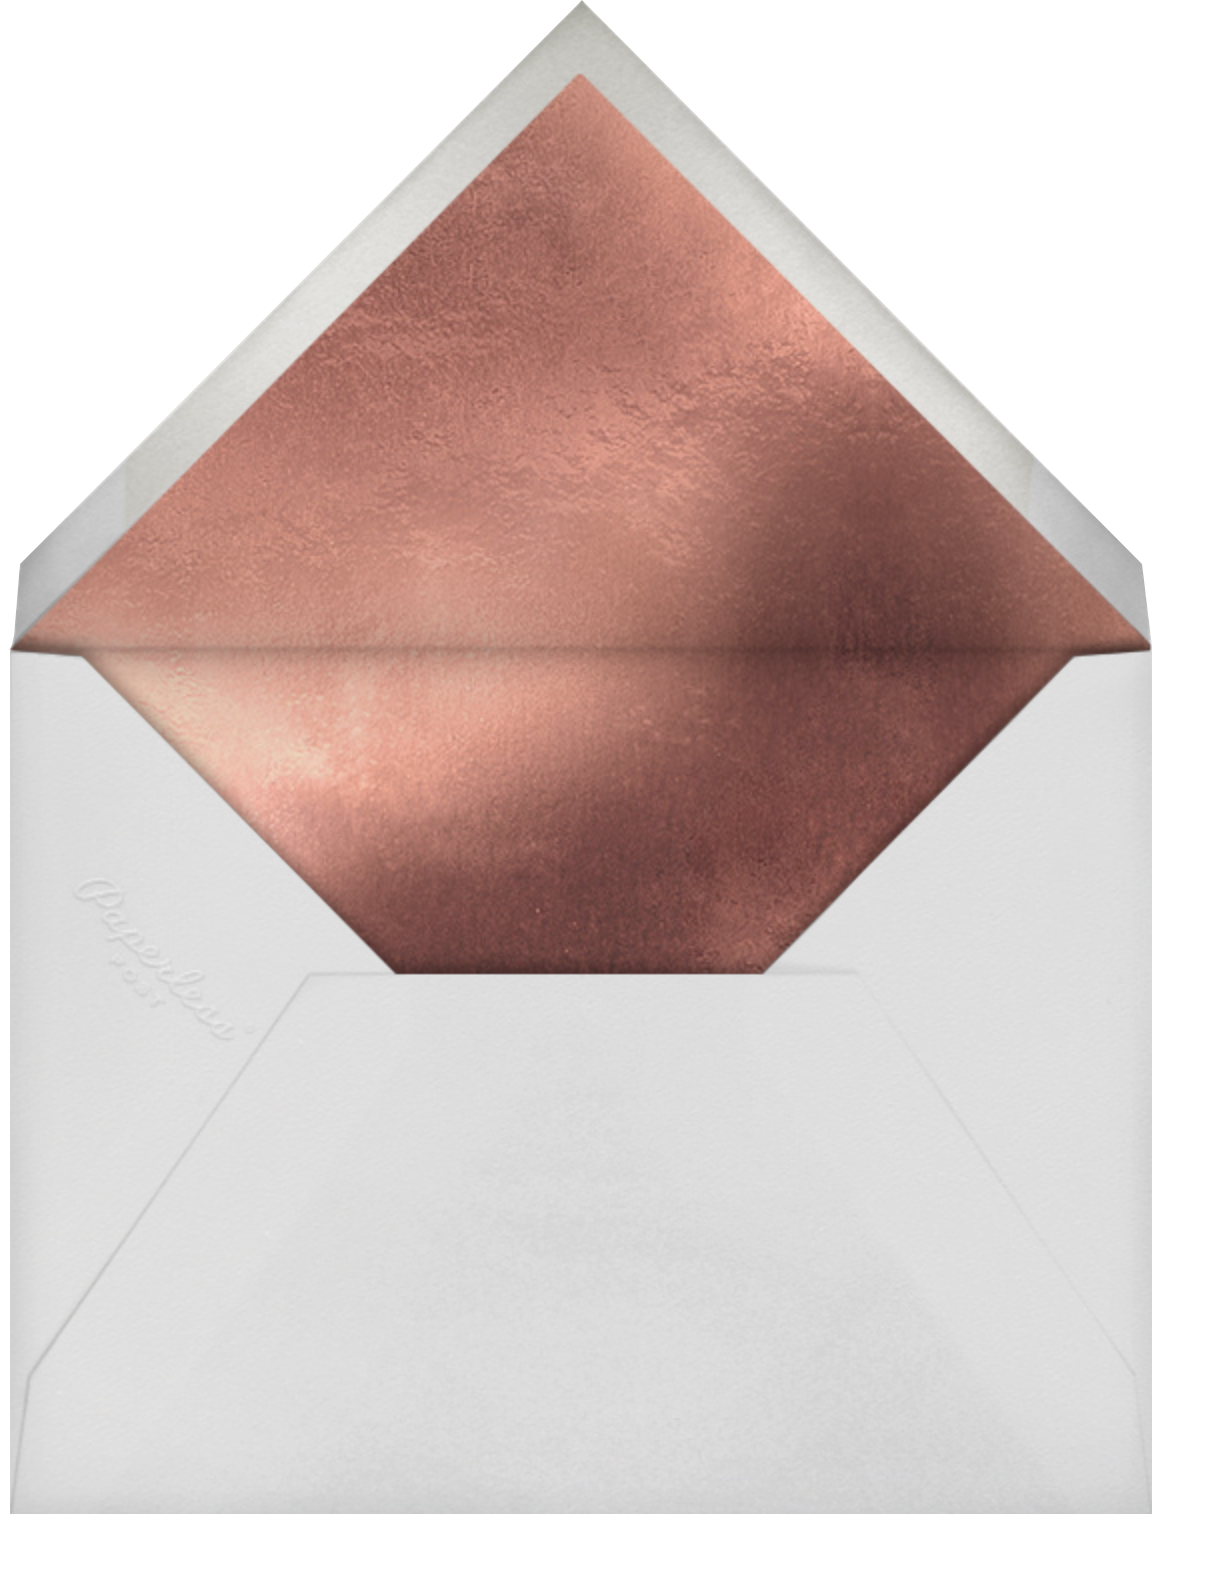 Golden Hearts - Rose Gold - kate spade new york - Save the date - envelope back